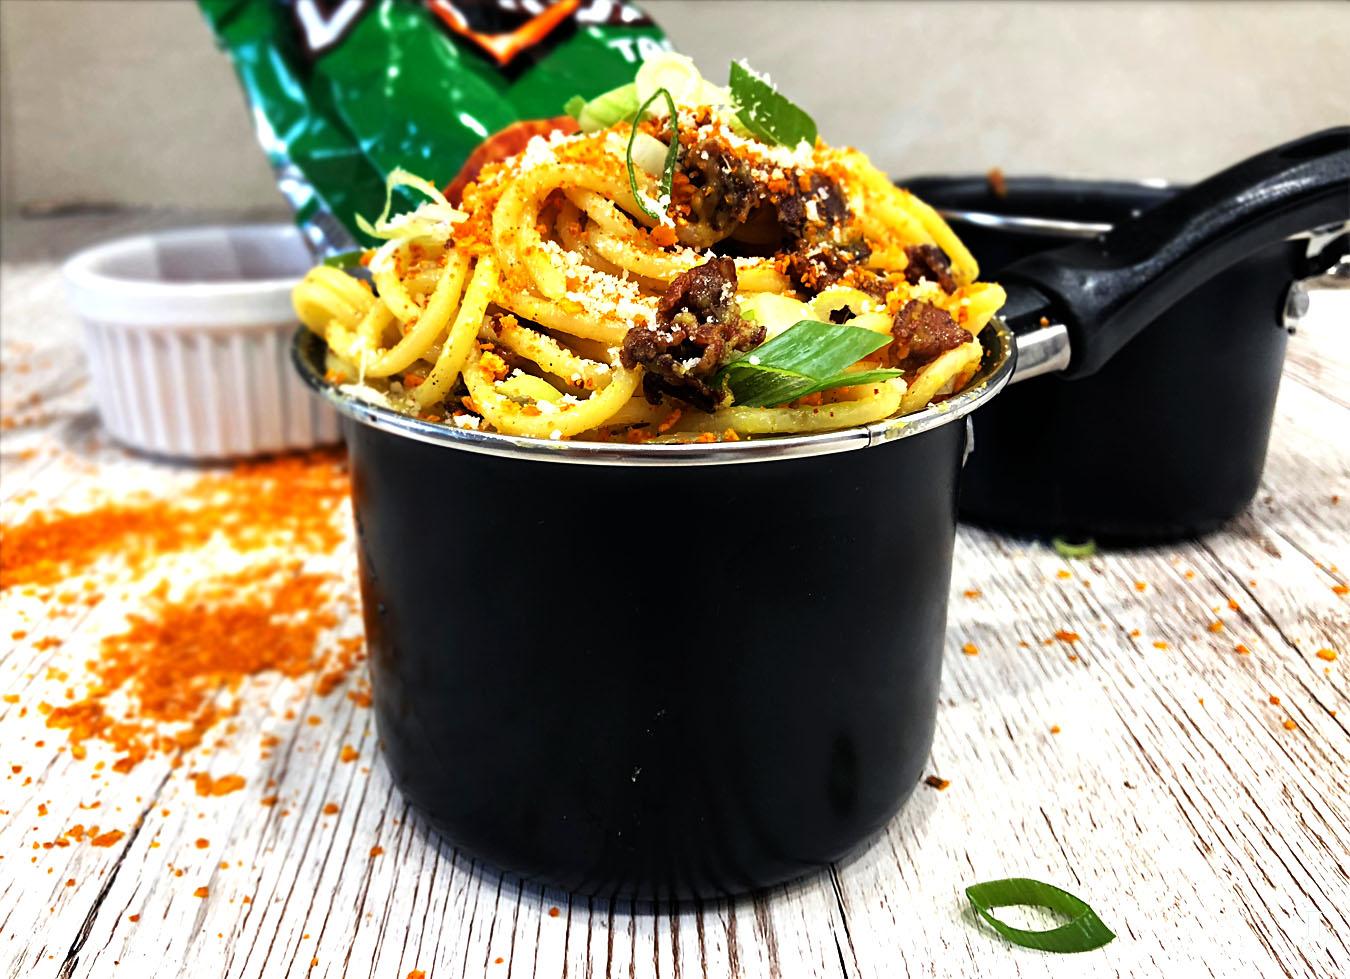 https://www.stonerchef.pl/wp-content/uploads/2018/08/spaghetti-doritonara.jpg